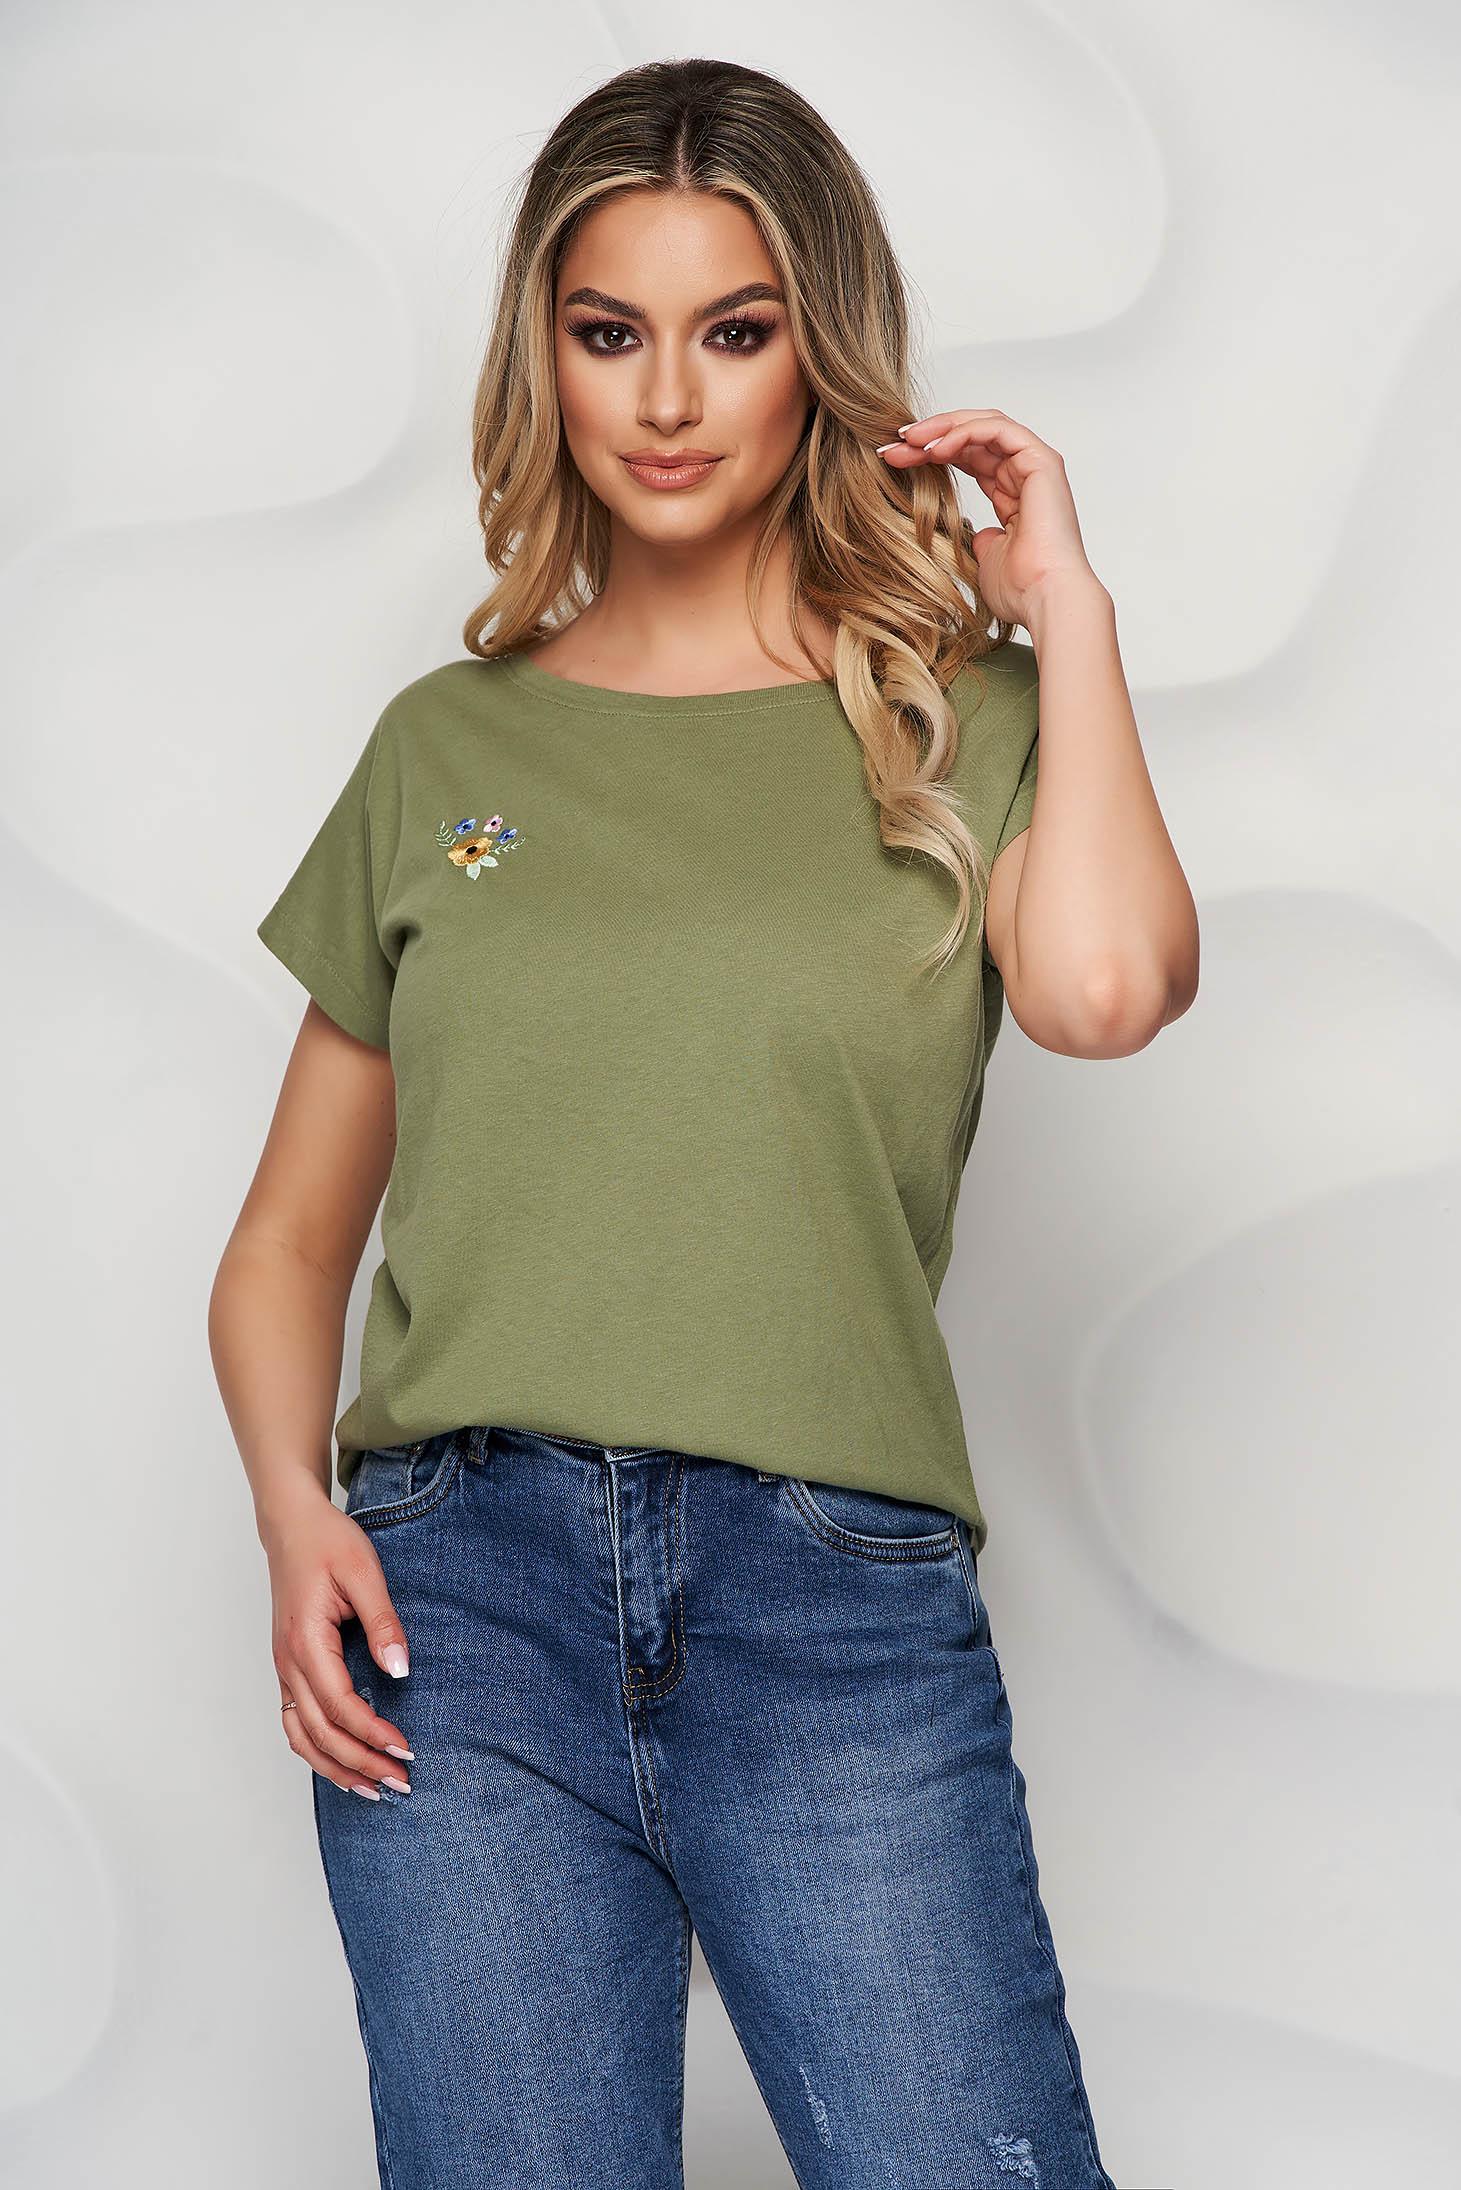 Tricou StarShinerS khaki din bumbac usor elastic cu croi larg si broderie florala